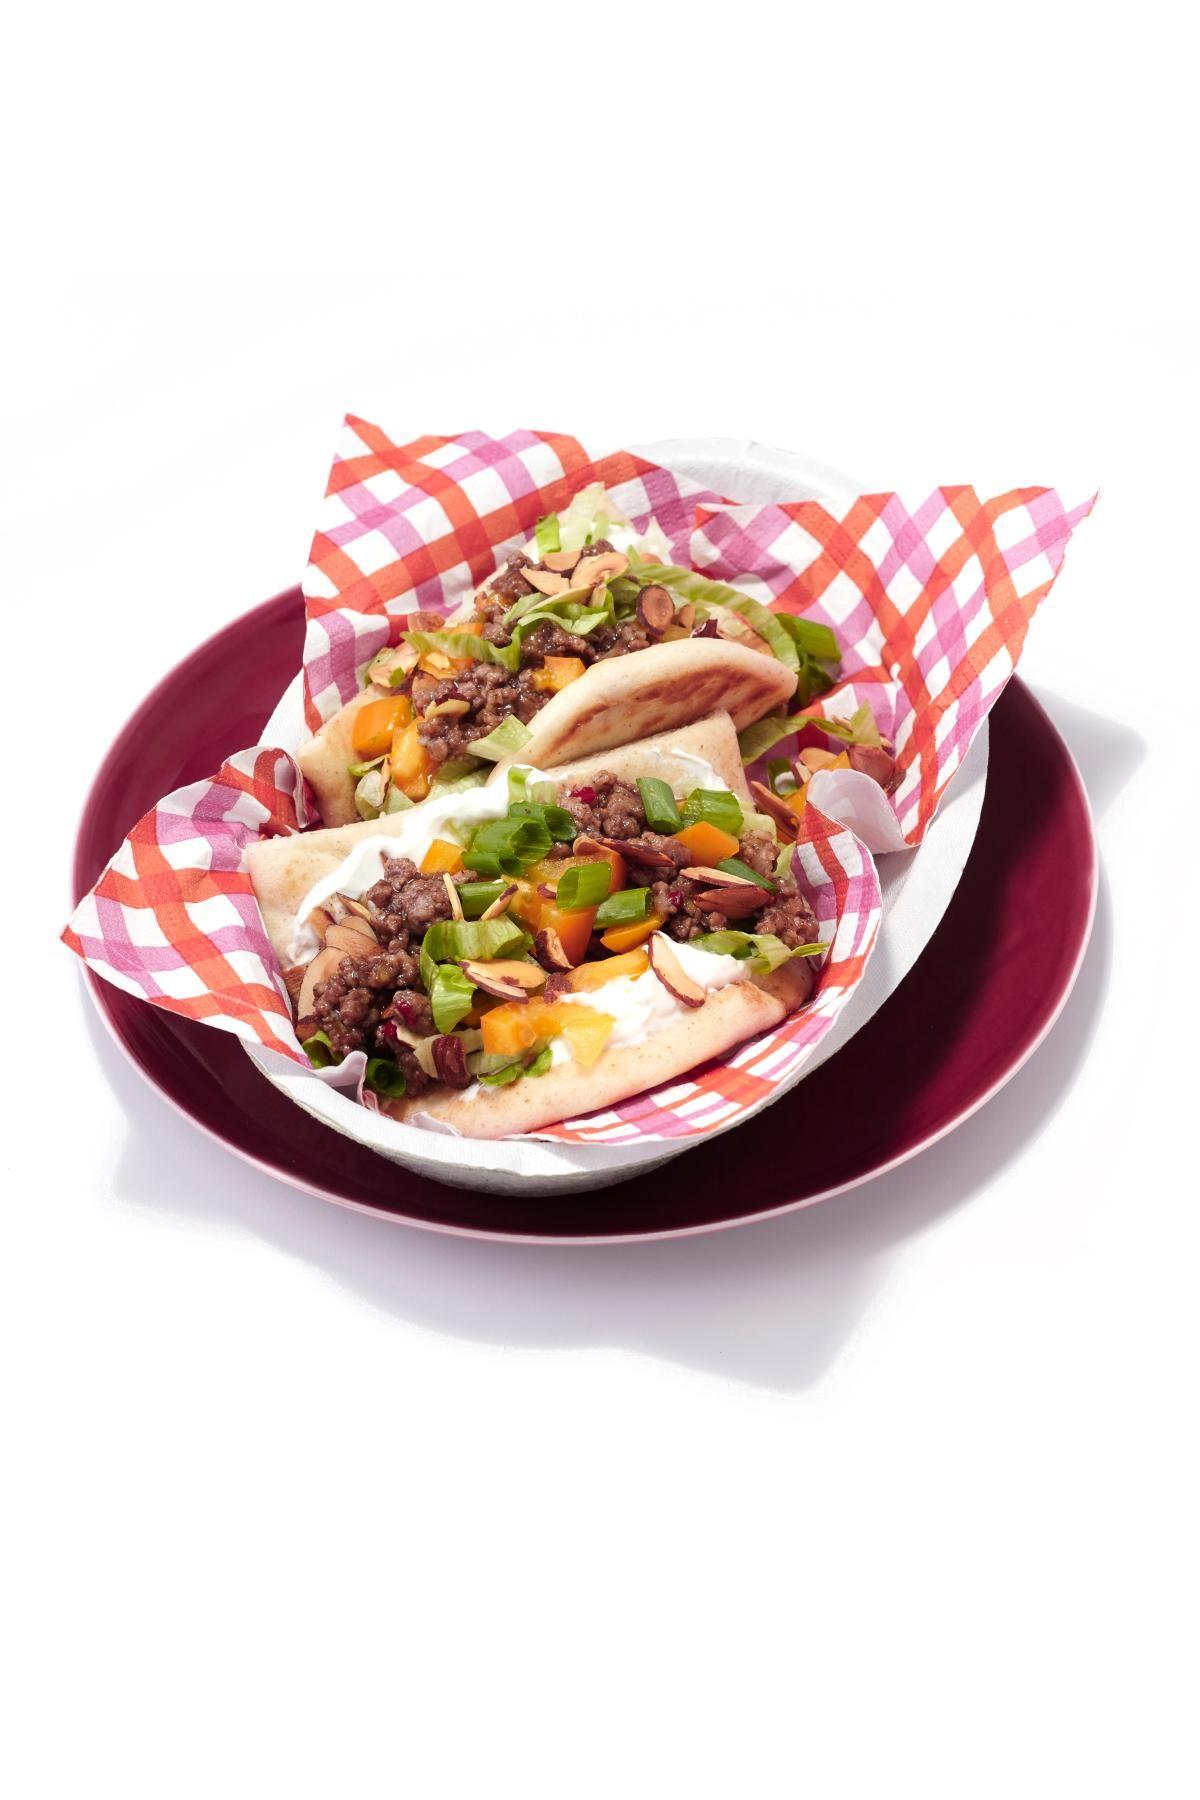 "Curry Turkey Naan Bread ""Tacos"" Recipe Naan, Naan"